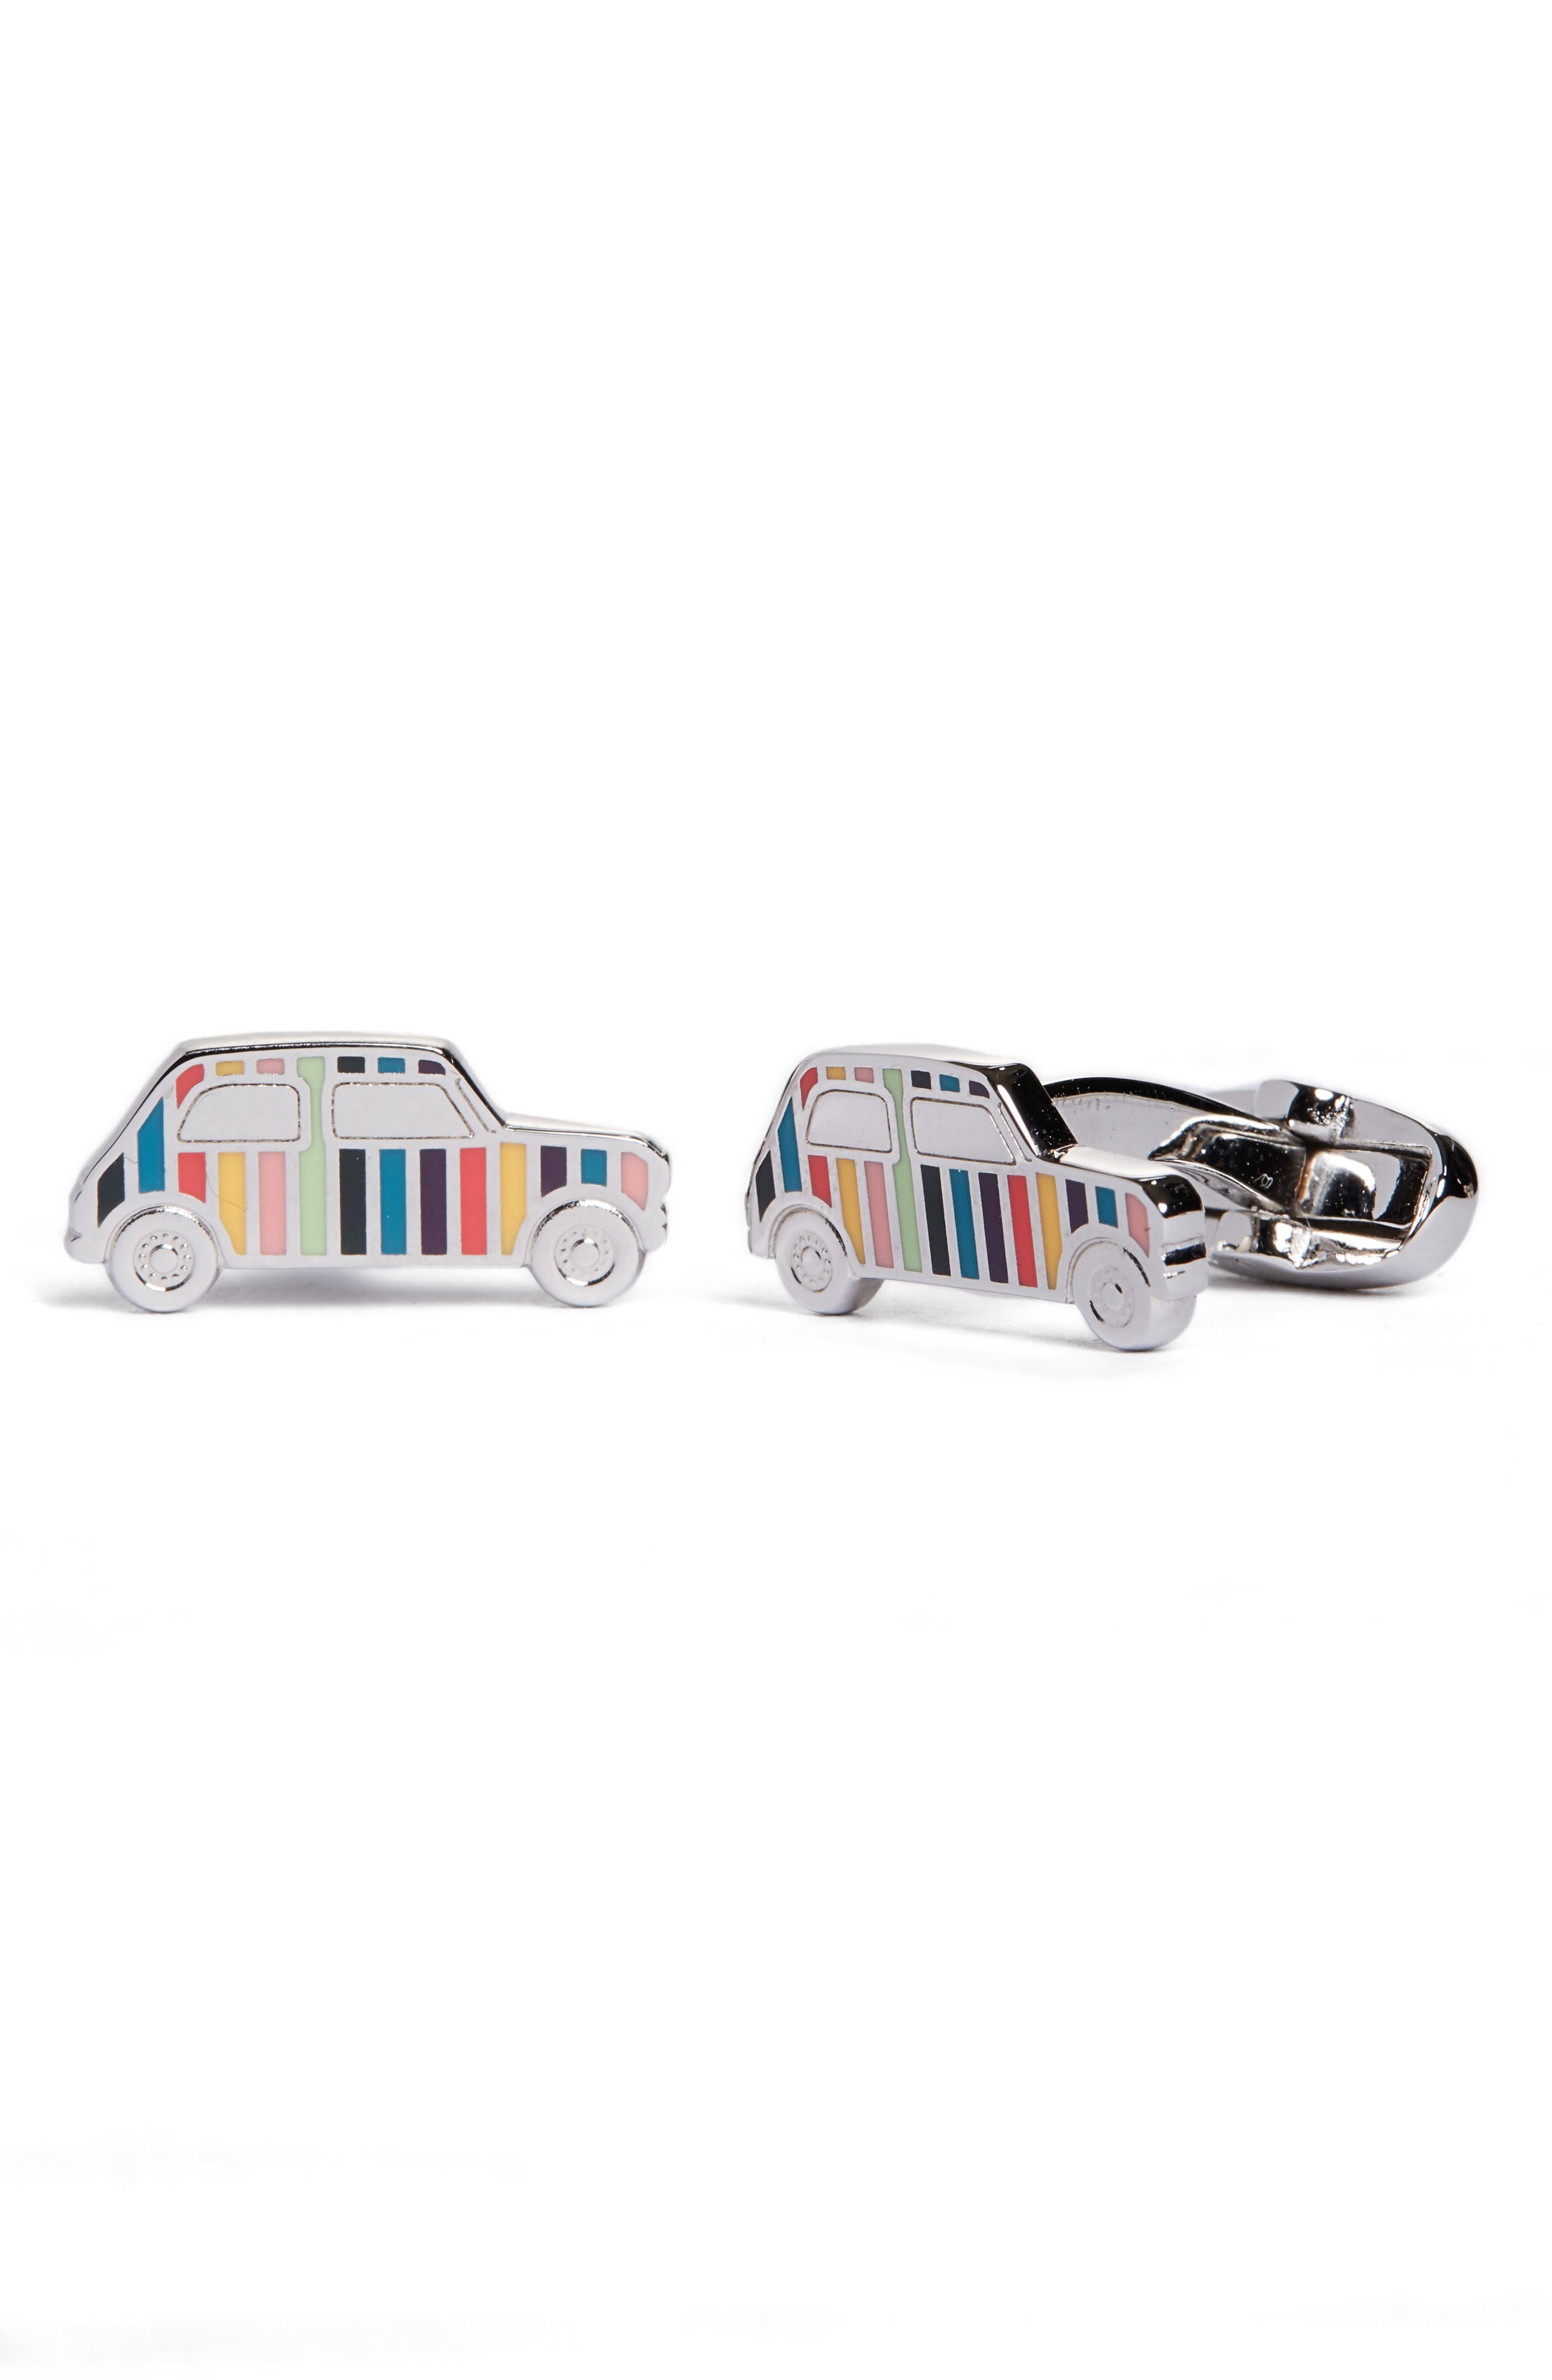 Enamel Stripe Car Cuff Links,                         Main,                         color, Metallic Silver